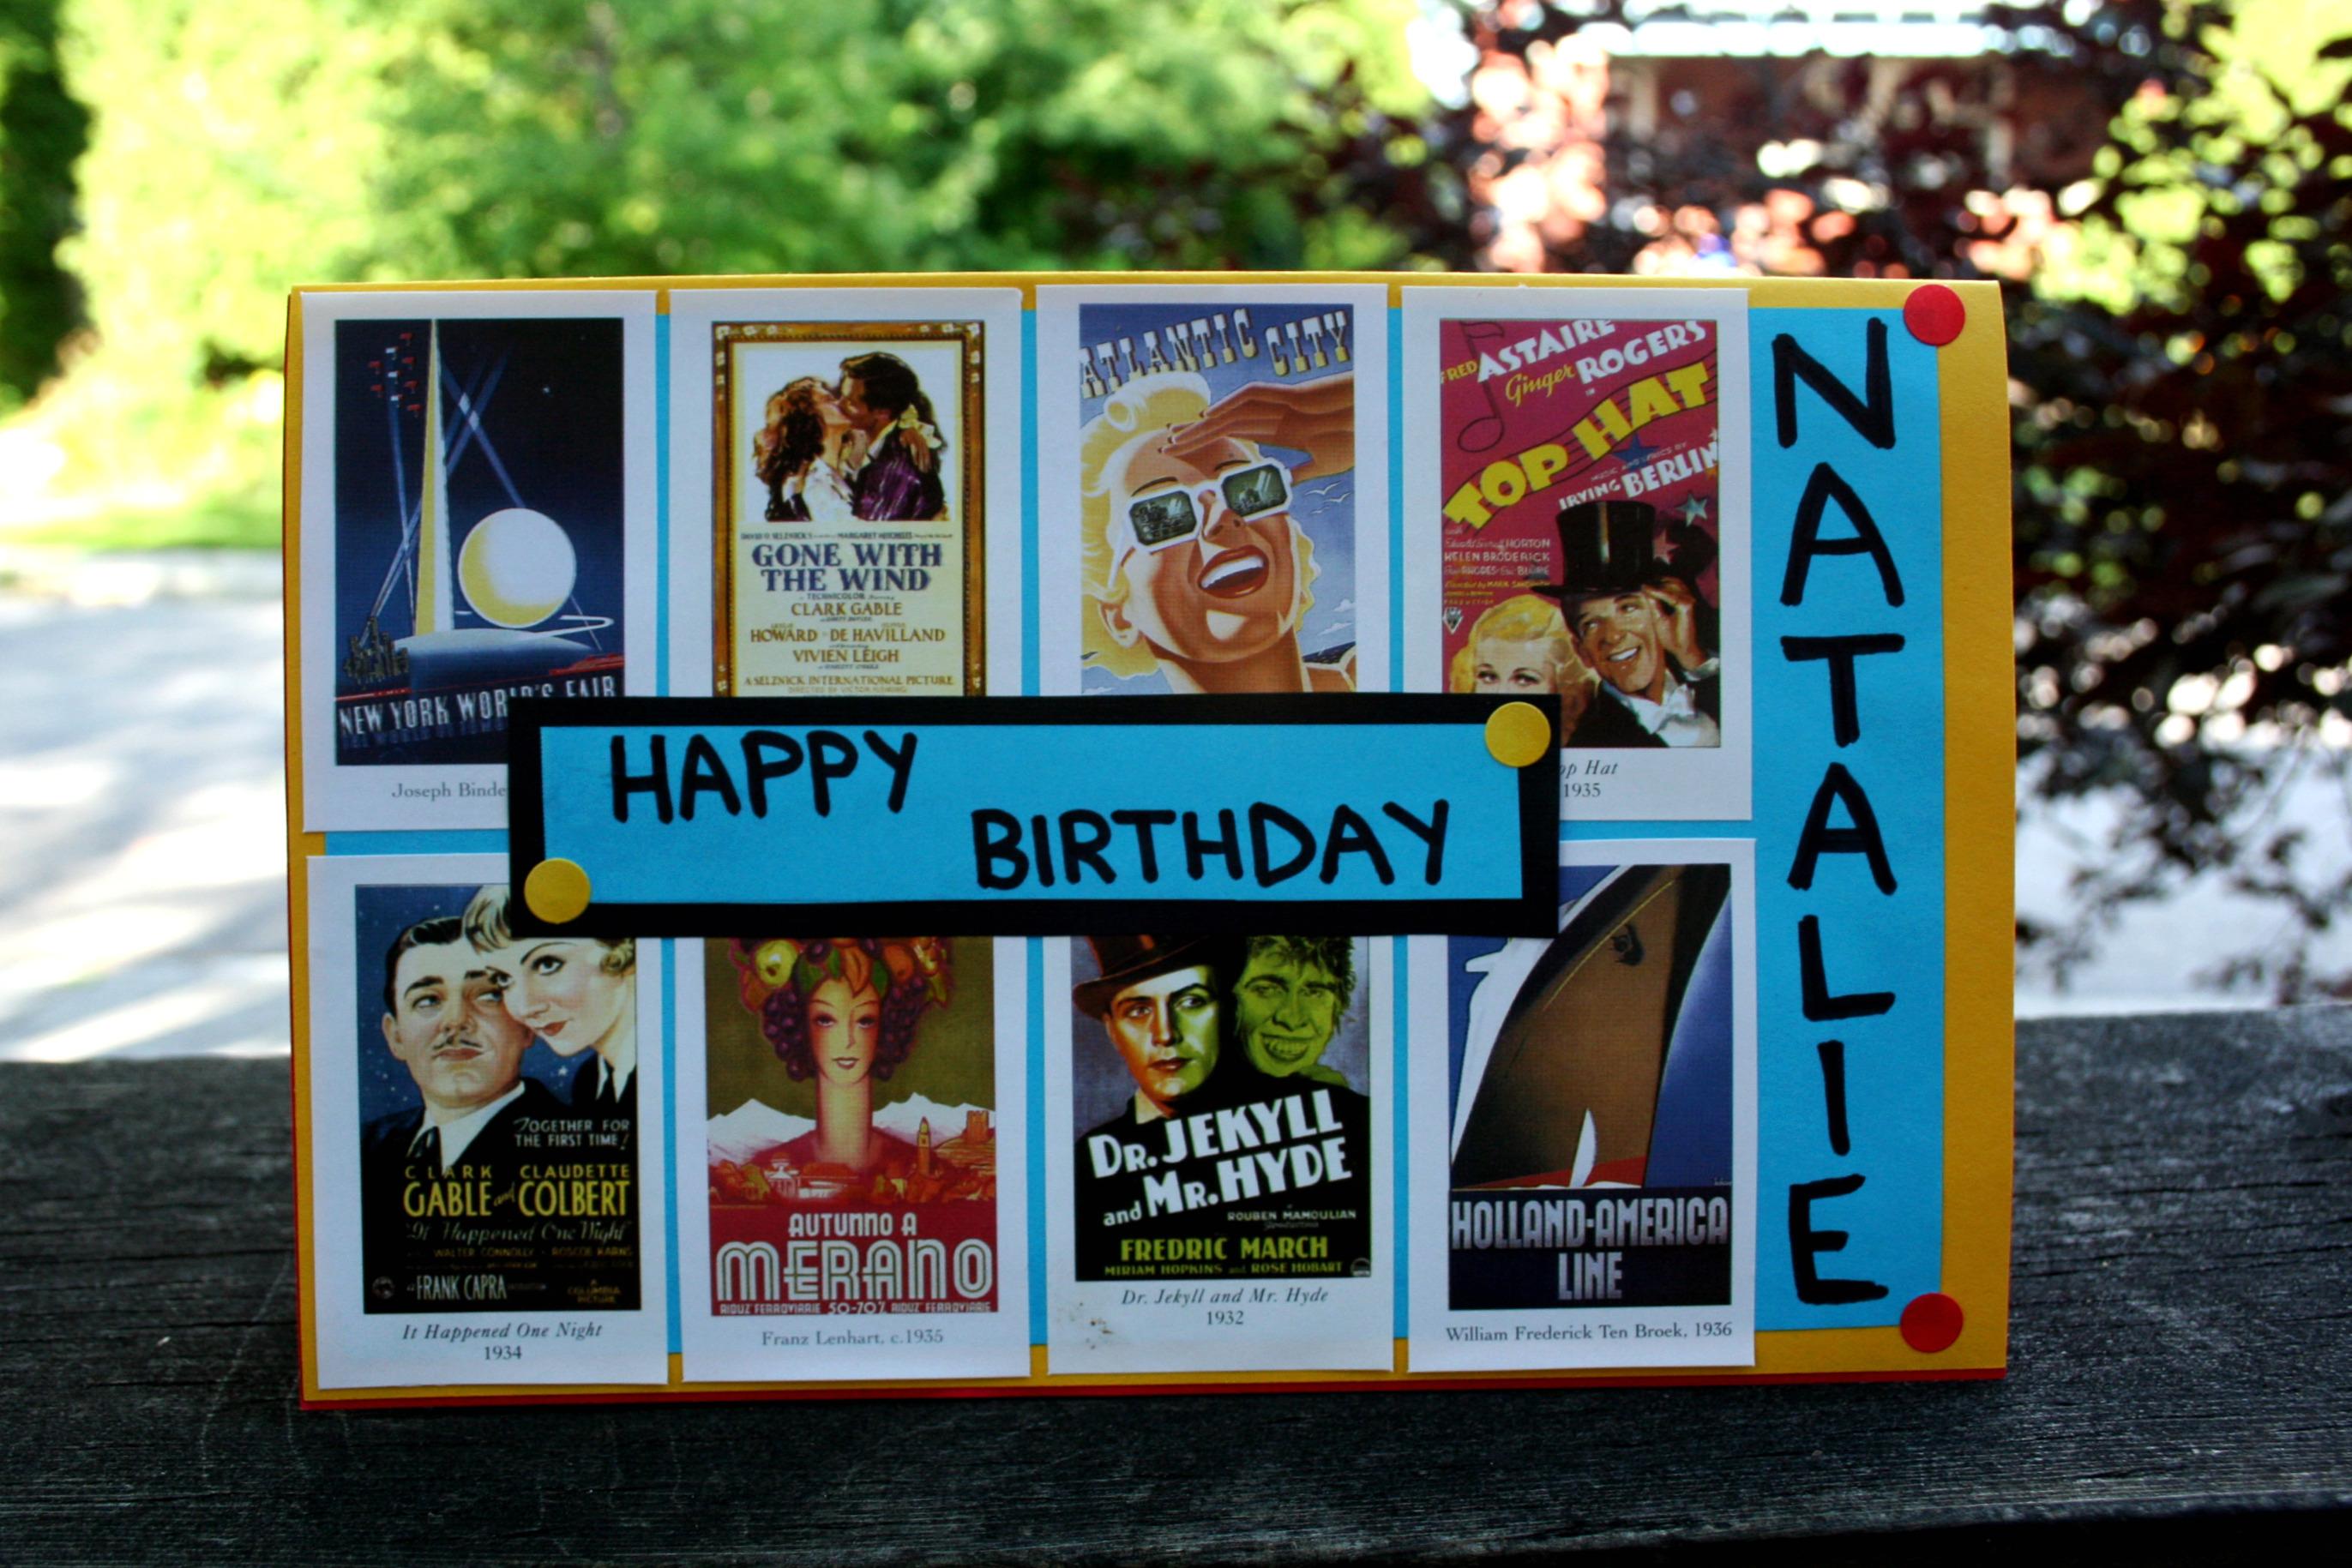 Happy Birthday Natalie Hilary Makes